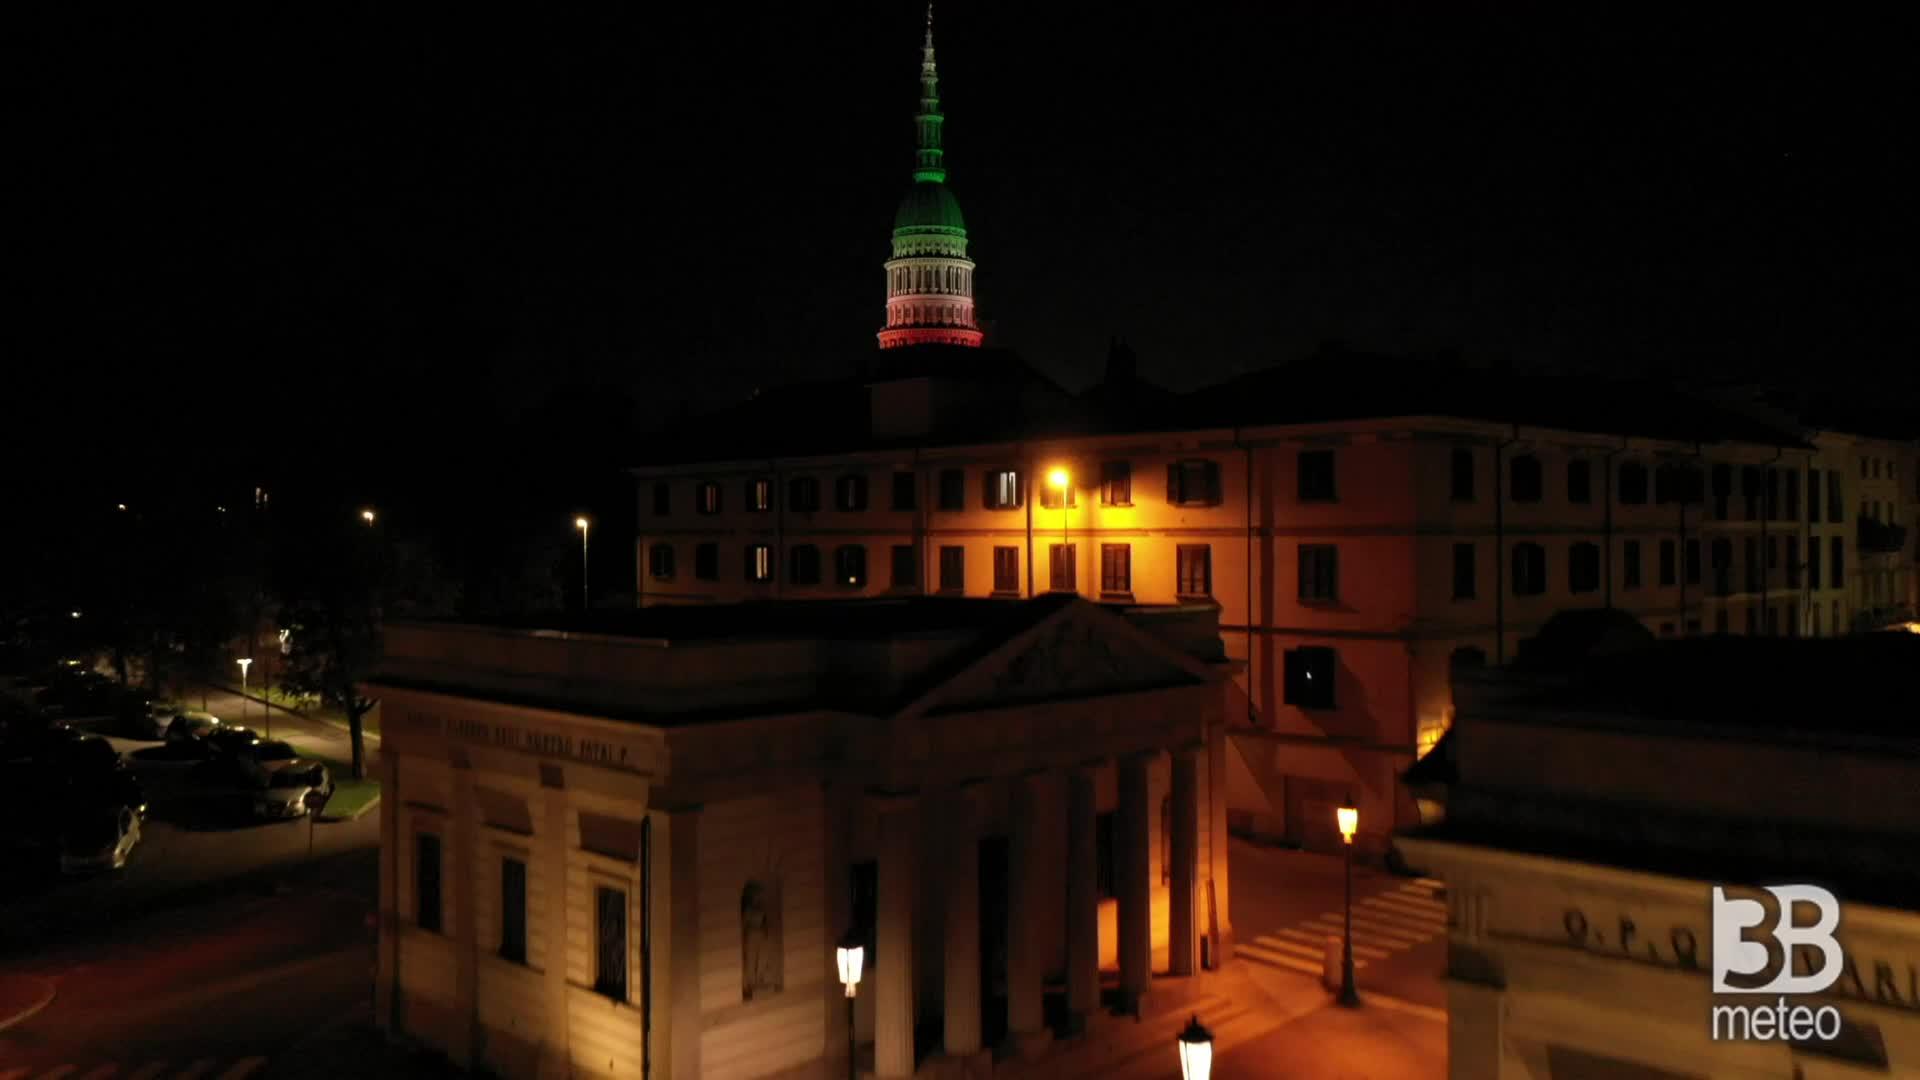 Coronavirus, Novara deserta: la cupola in veste tricolore